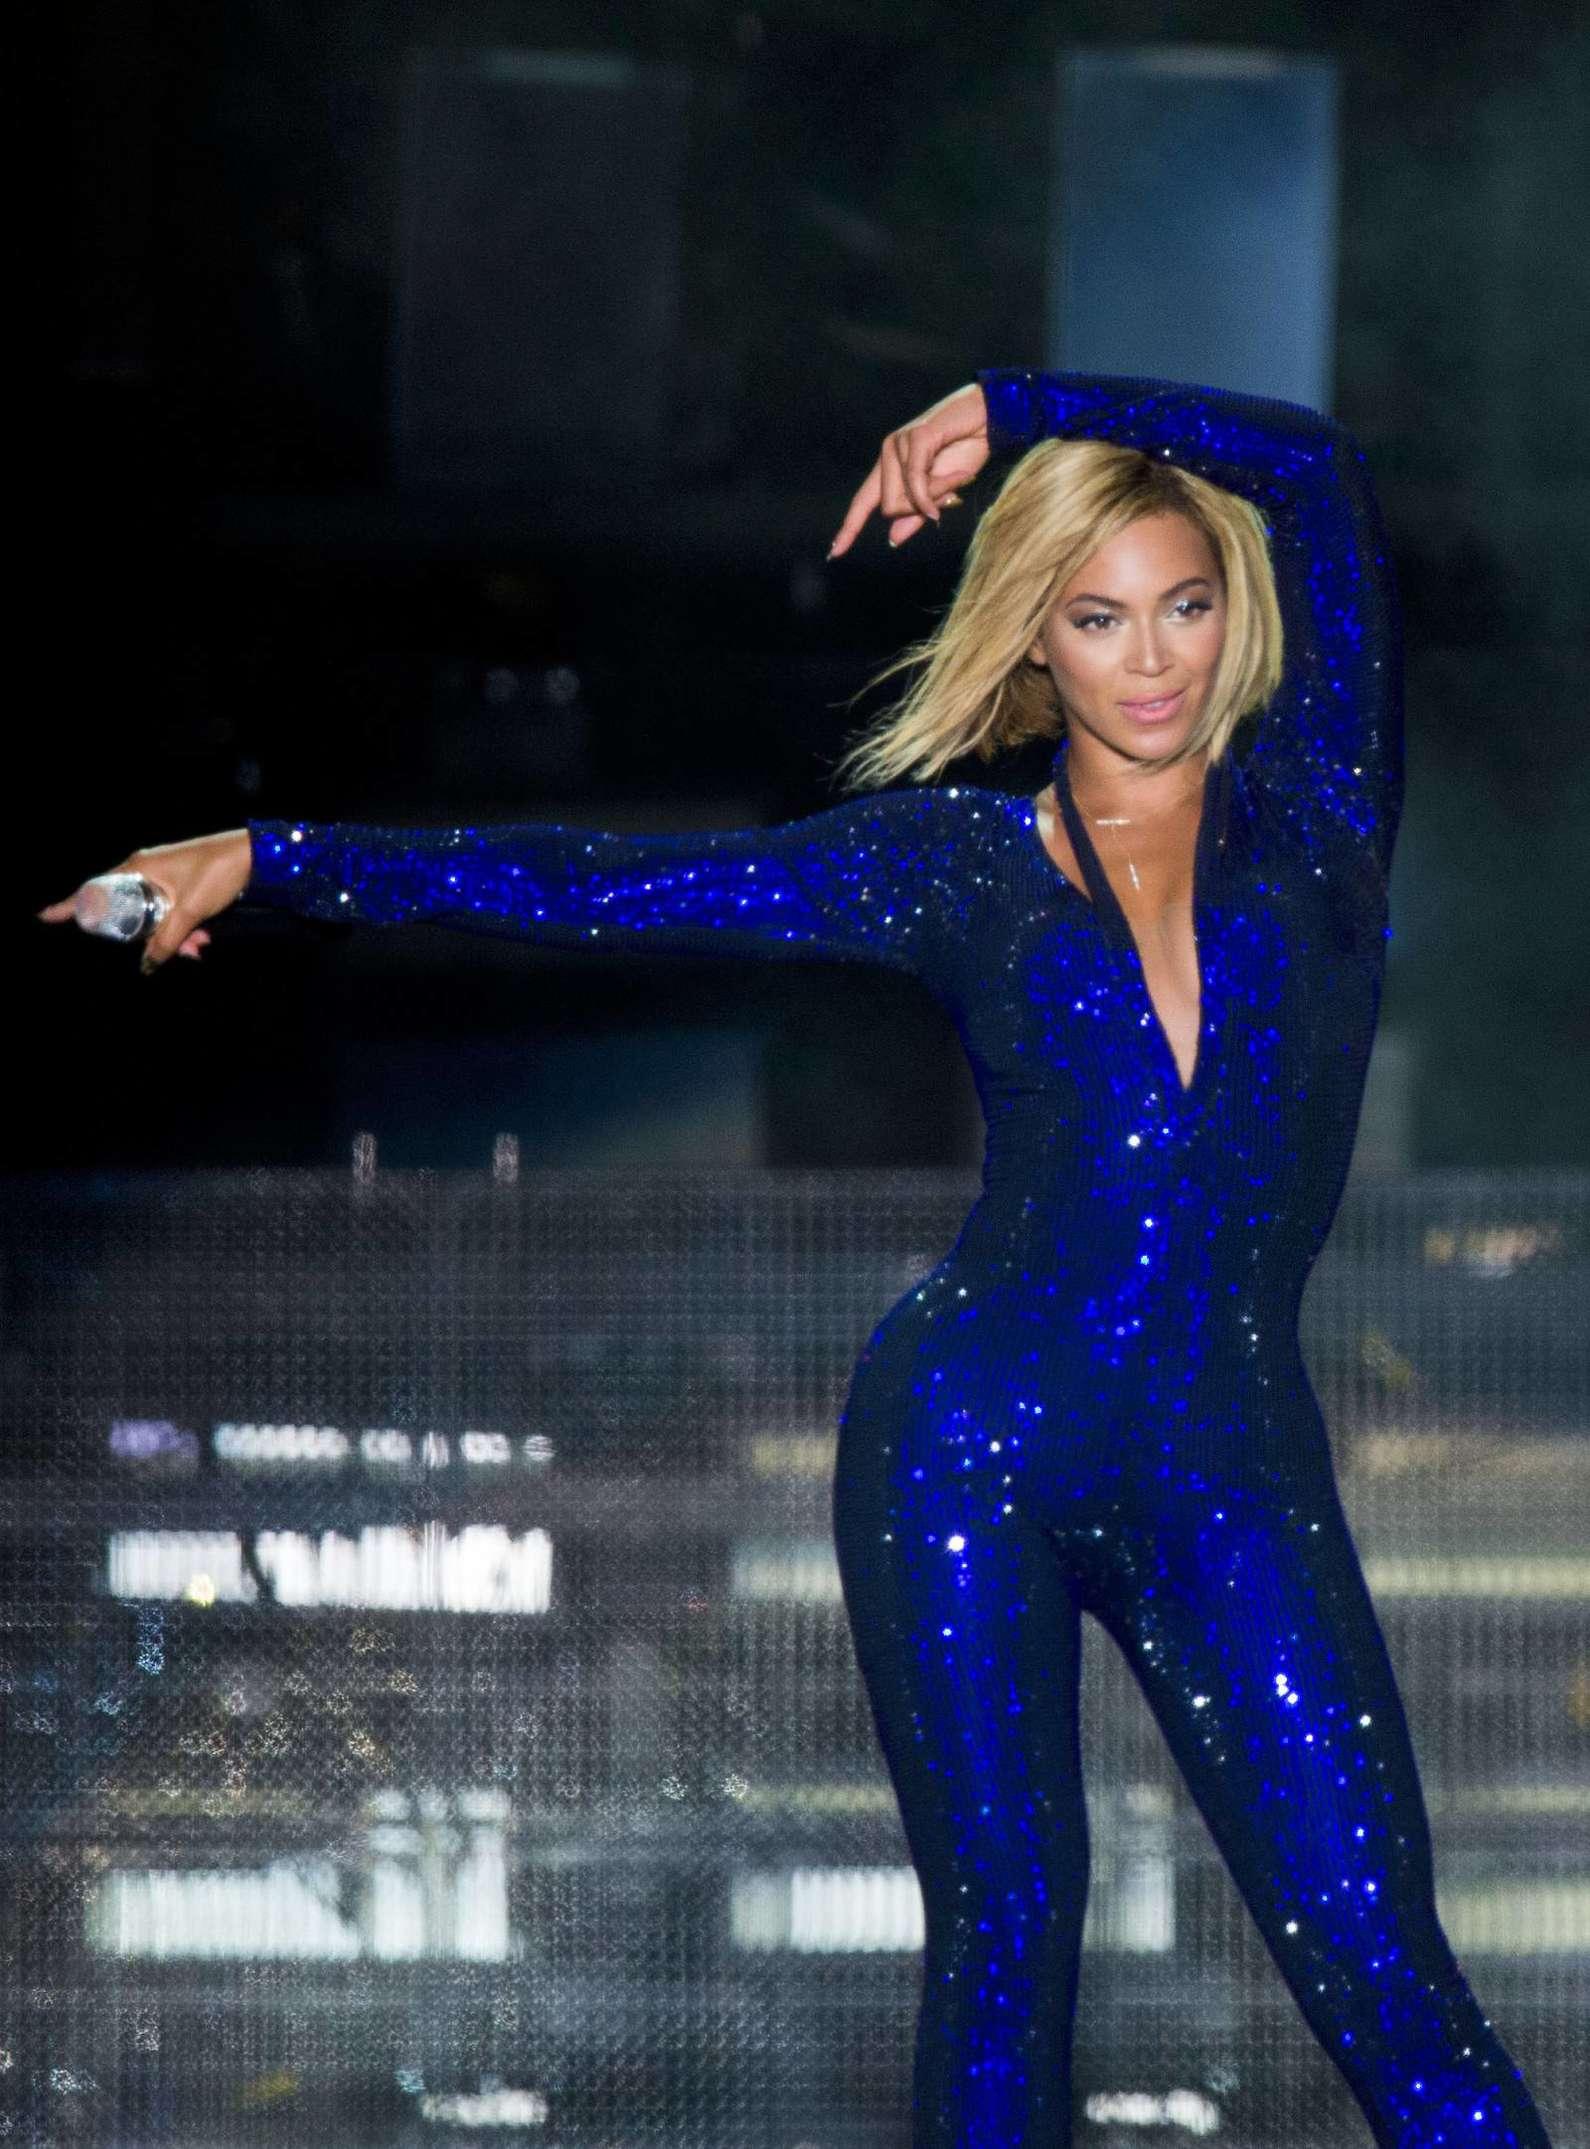 Beyonce Photos: V Festival 2013 in England -37